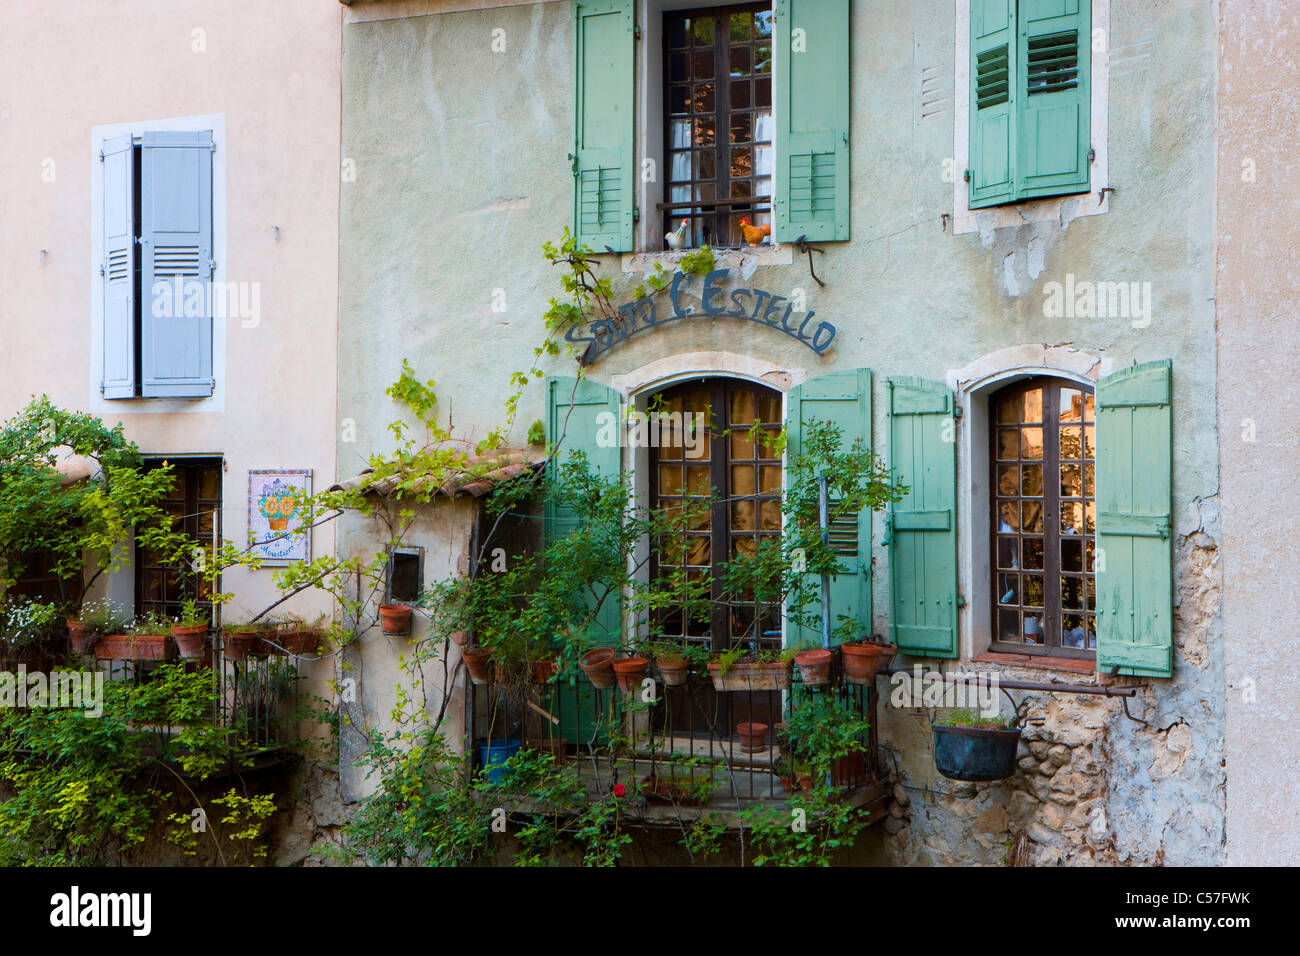 Moustiers-Sainte-Marie, France, Europe, Provence, Alpes-de-Haute-Provence, village, house, home, window, balcony Stock Photo